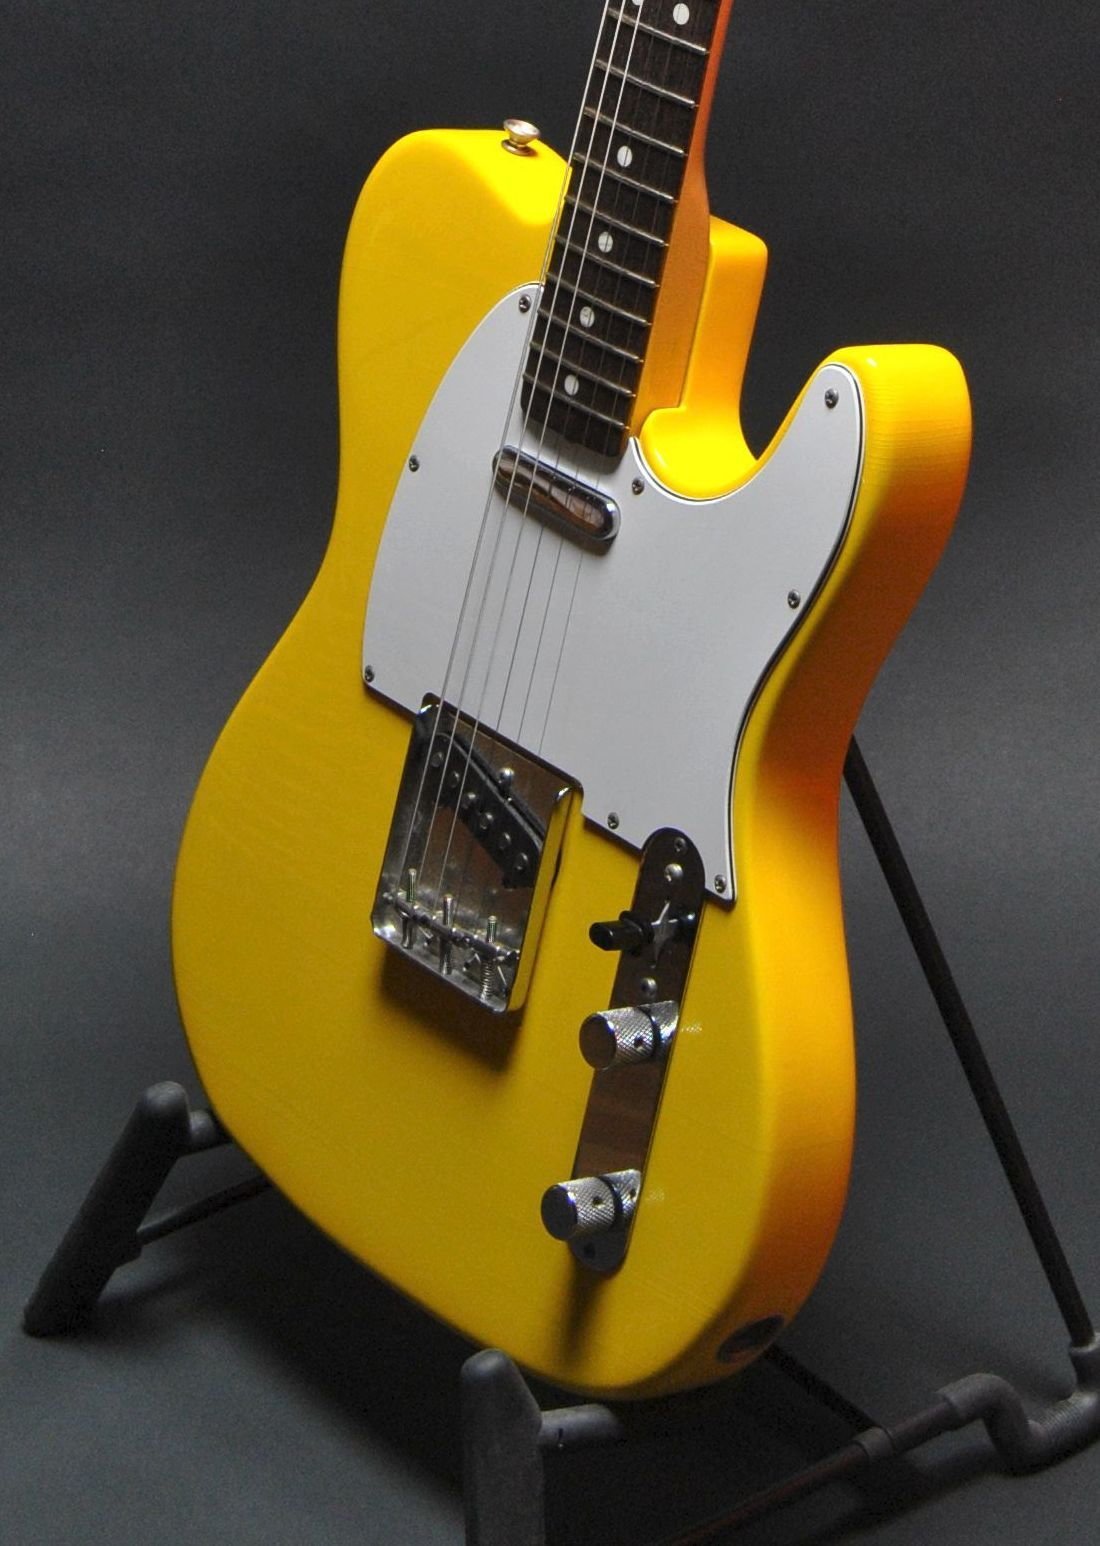 Gorgeous Yellow Tele Fender Acoustic Guitar Telecaster Guitar Fender Telecaster